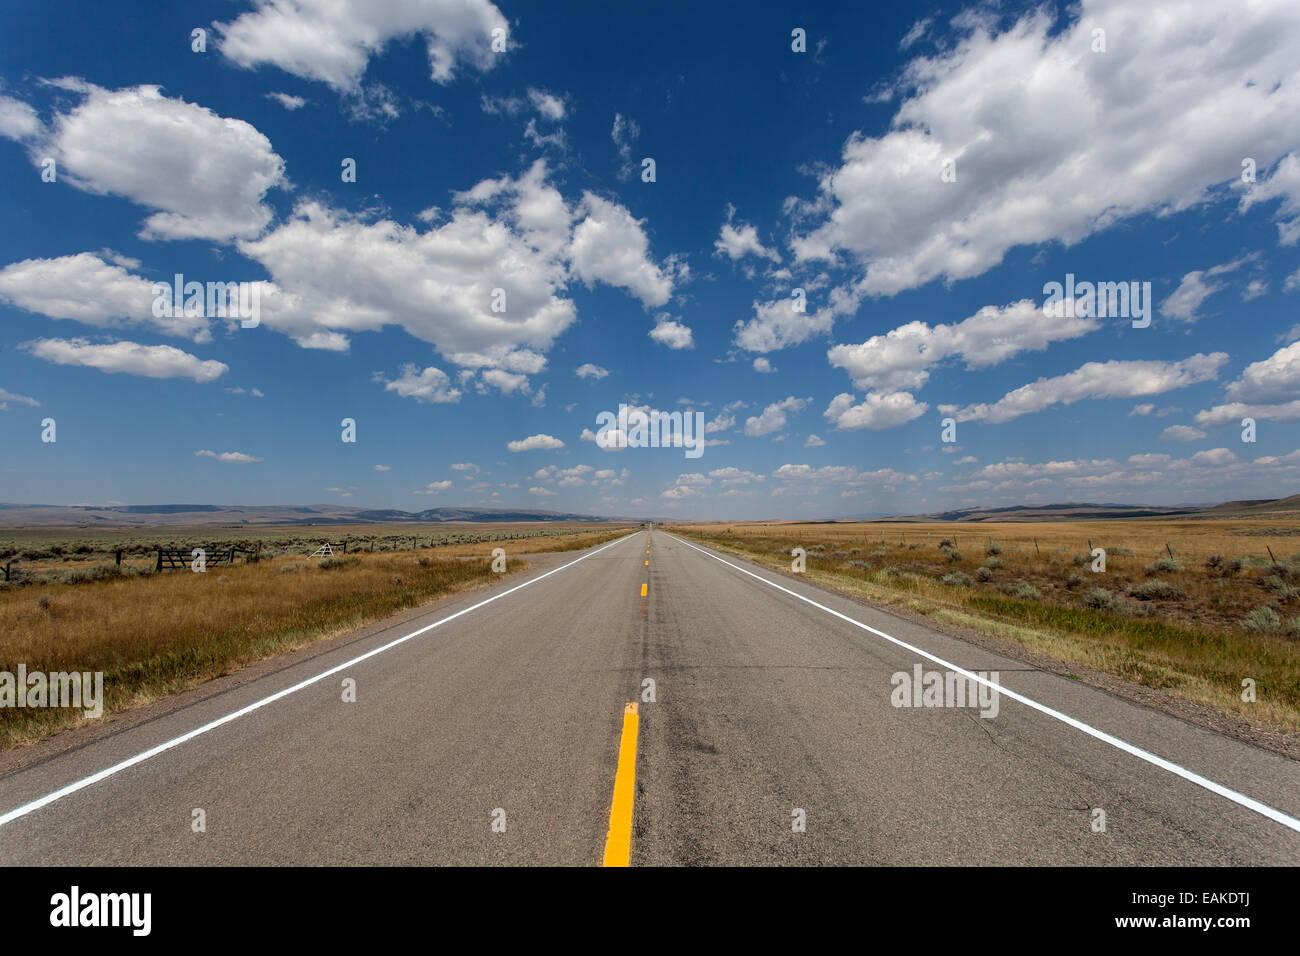 Highway no. 89, near Livingston, Montana, United States - Stock Image